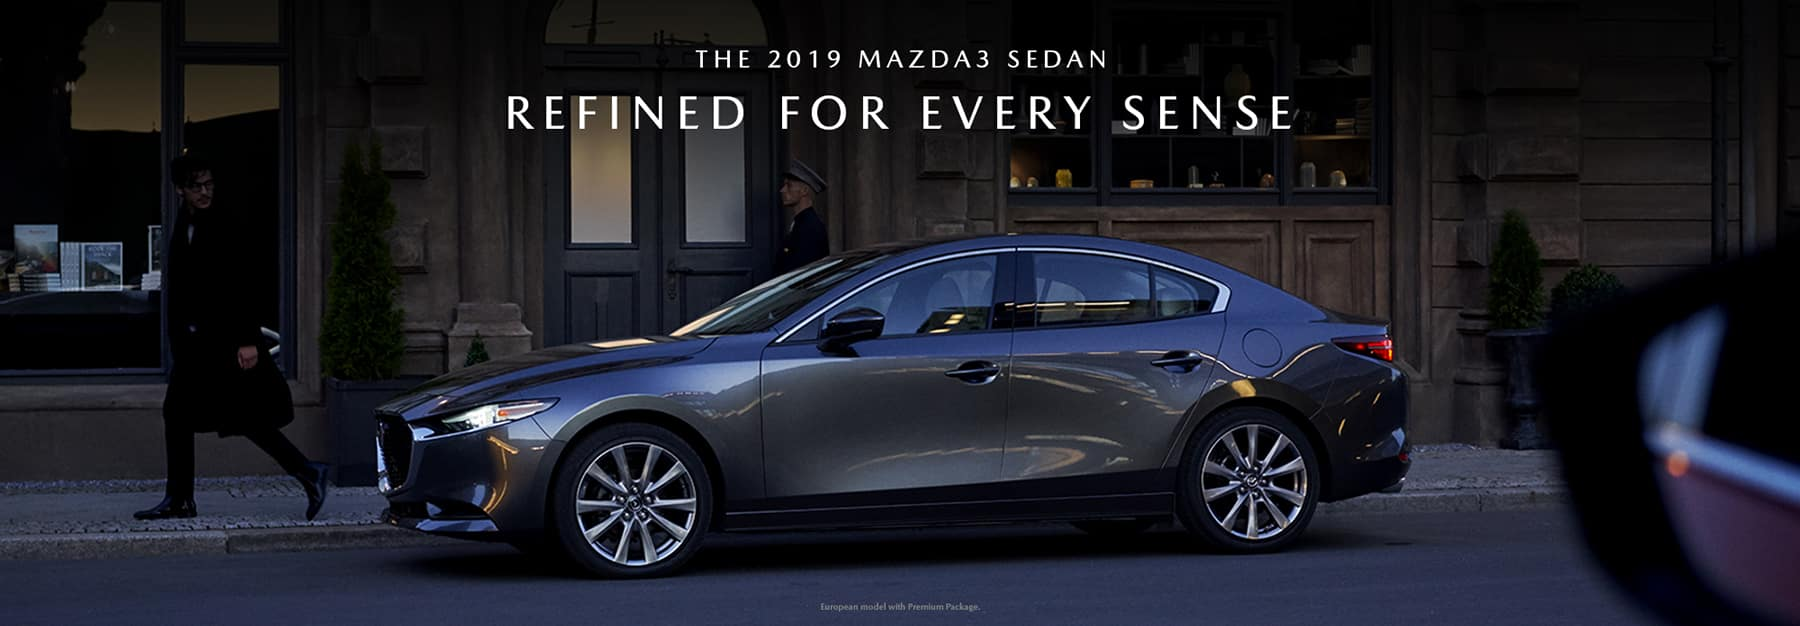 New Mazda Lease & Finance Specials | Morrie's Inver Grove Mazda